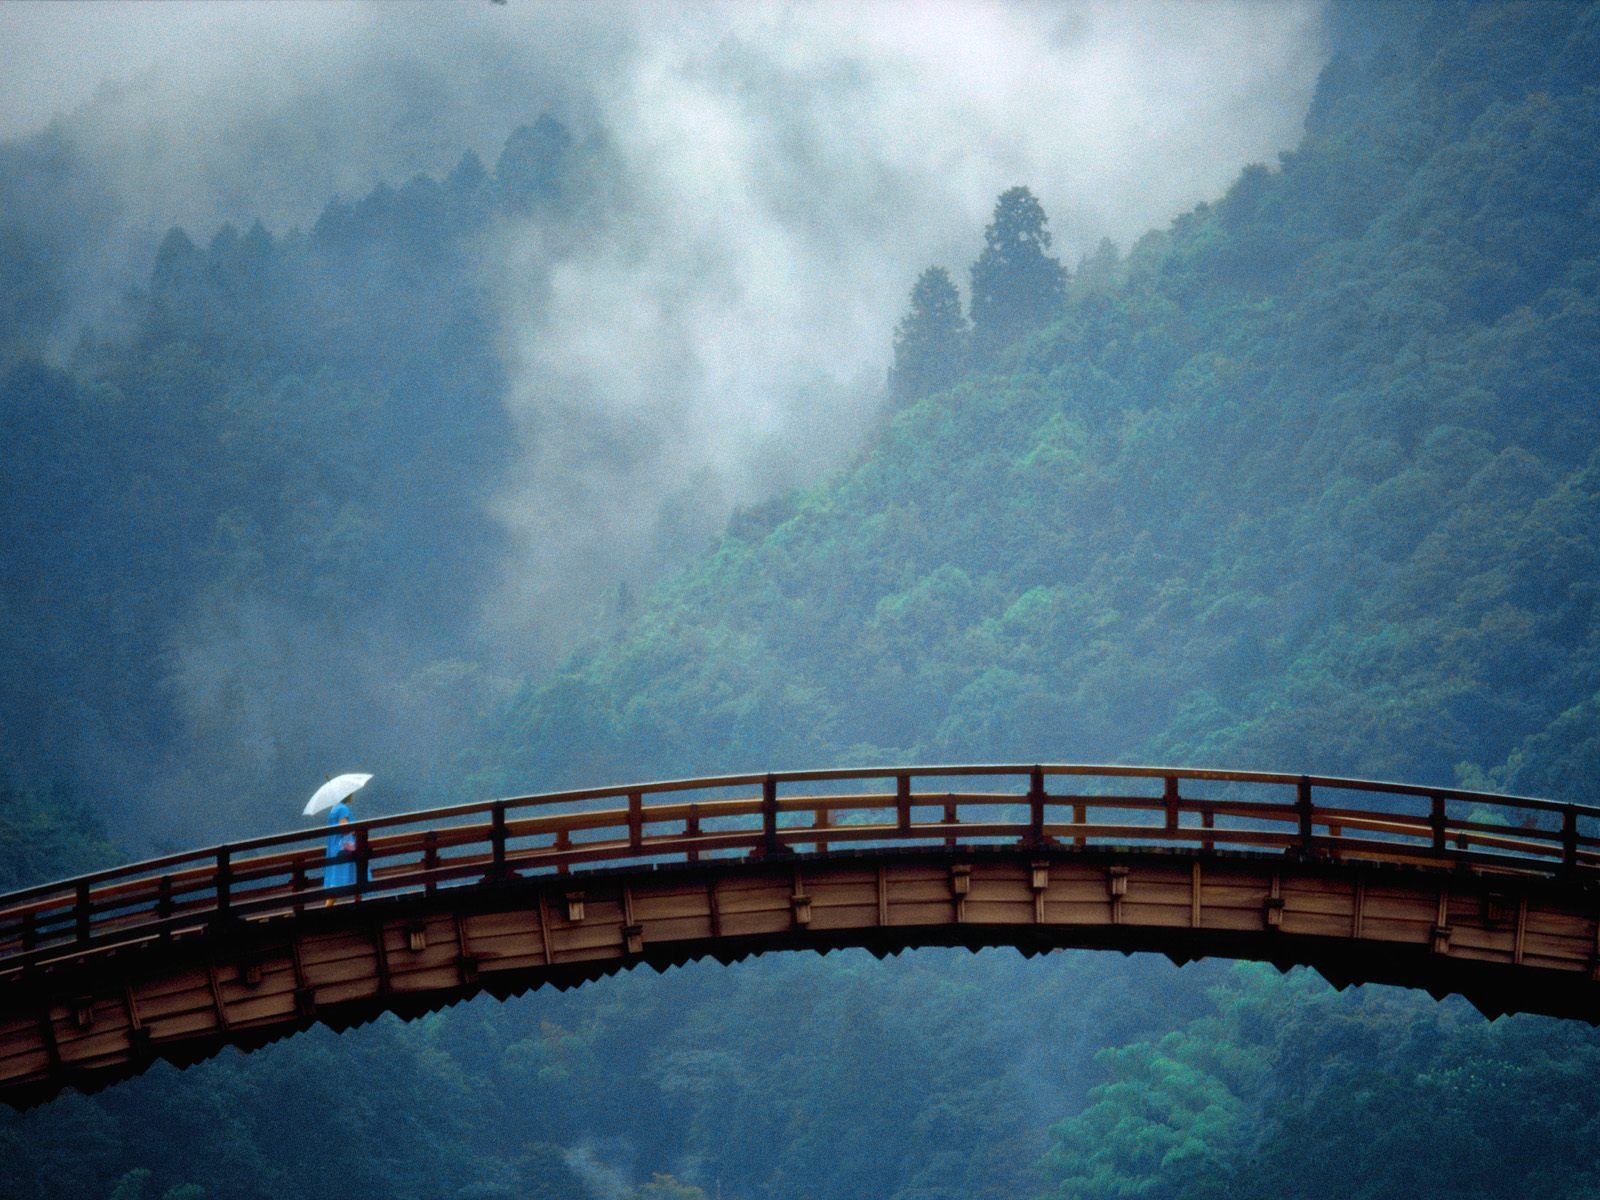 http://1.bp.blogspot.com/_8K6OZ7c_0sw/TPCkCI9WUmI/AAAAAAAABOM/Ua9KuXLDJsk/s1600/_Yamaguchi_Prefecture__Japan.jpg